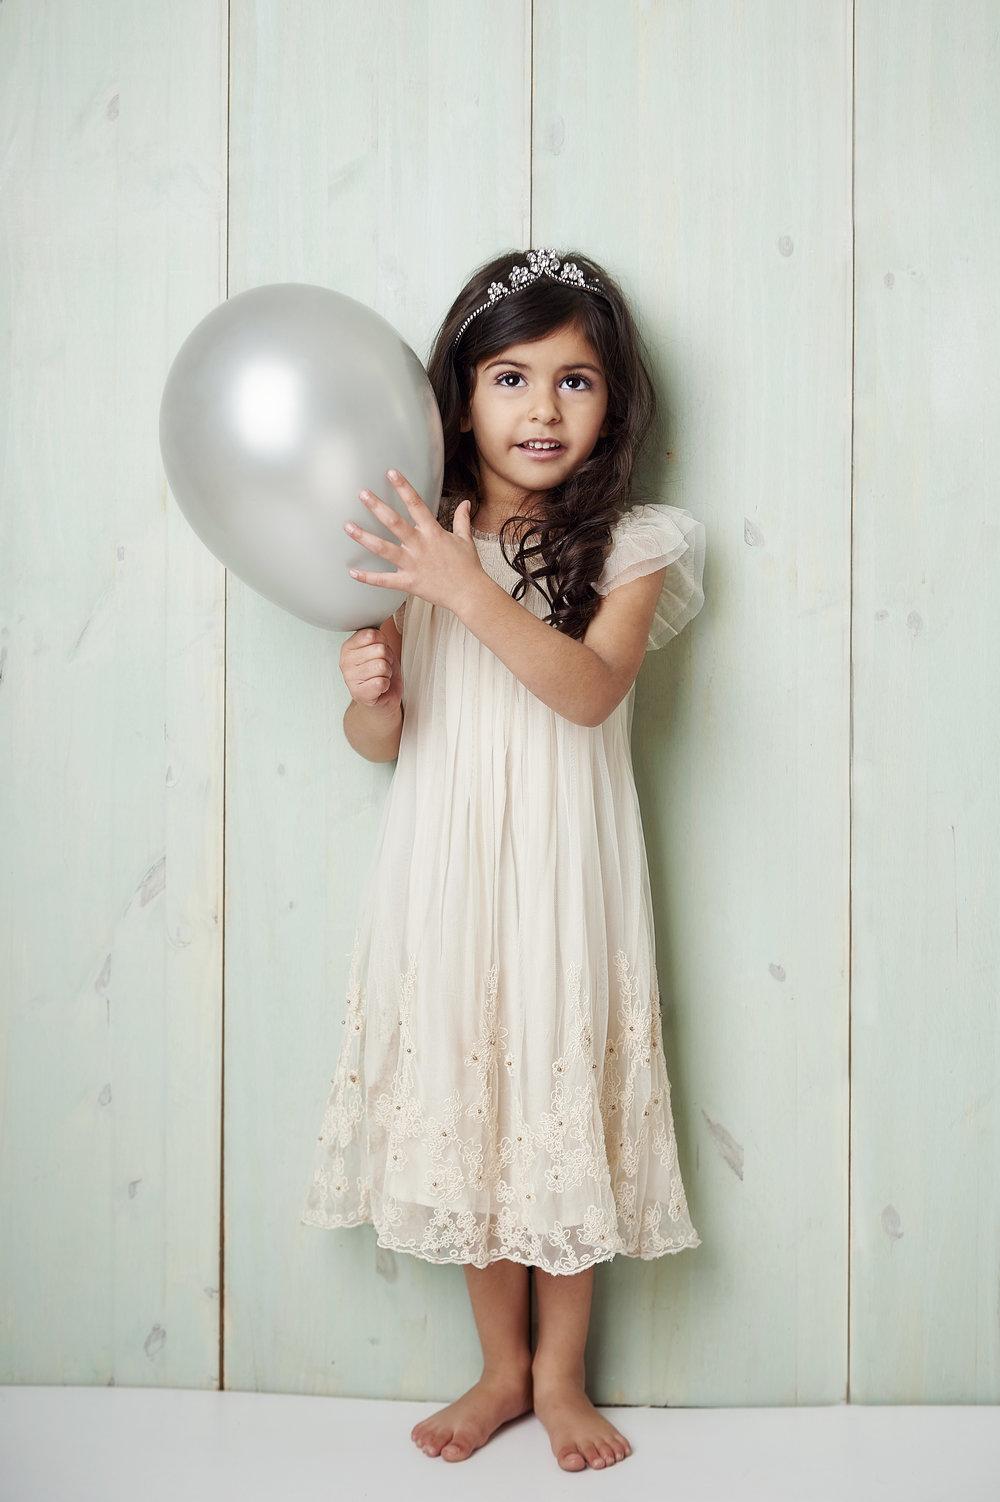 Marta-Hewson-Classical-portrait-young-girl-tiara-silver-baloon.jpg